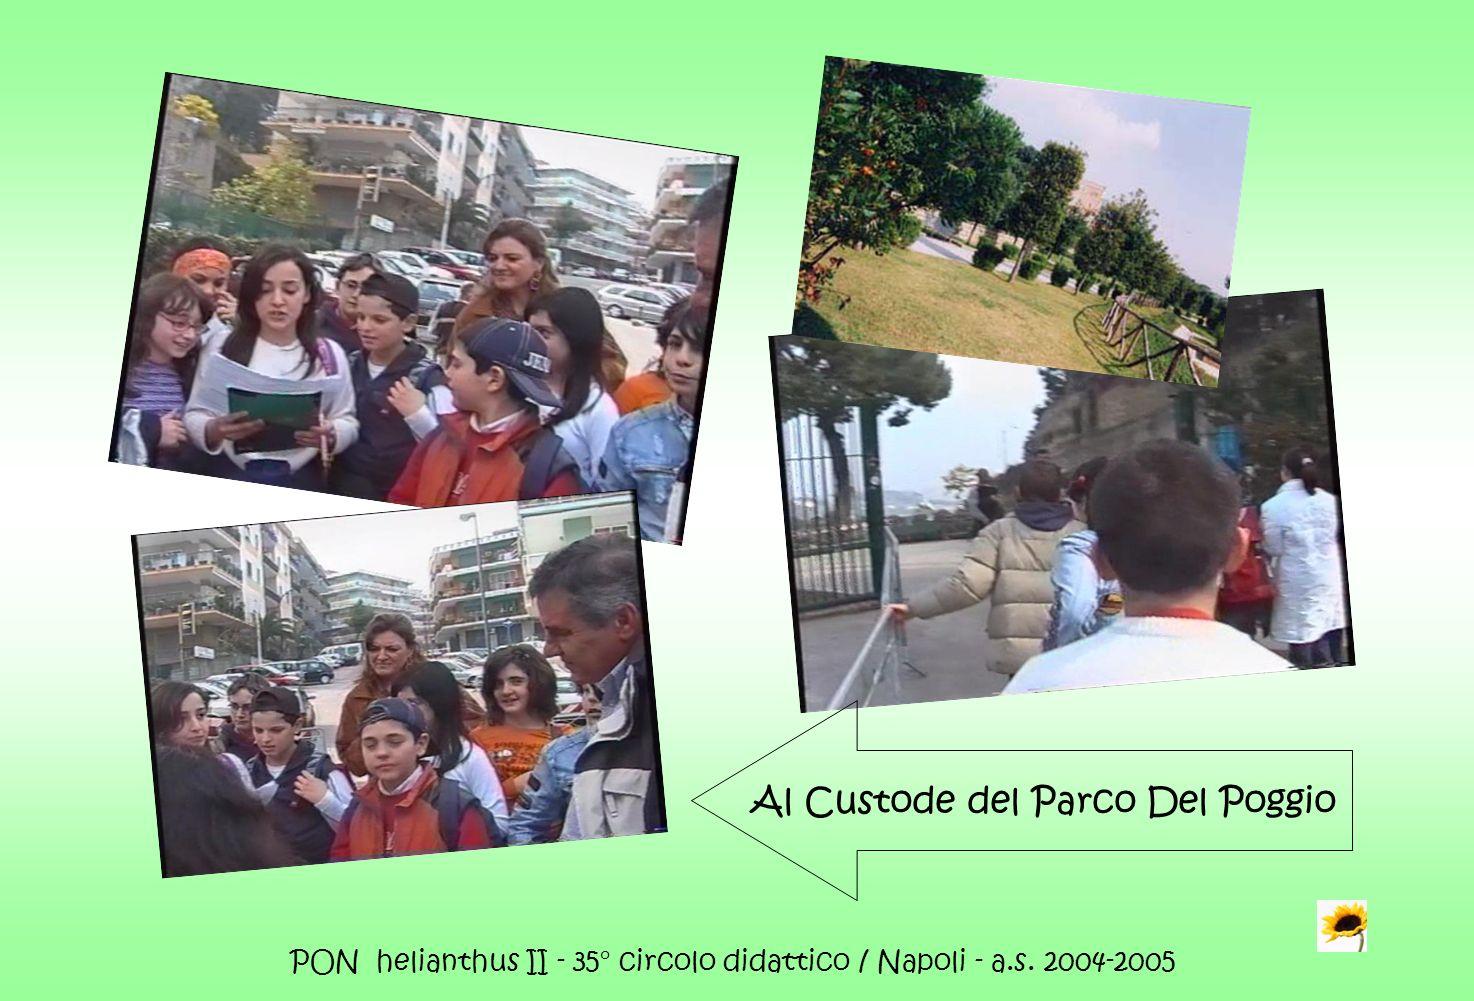 PON helianthus II - 35° circolo didattico / Napoli - a.s. 2004-2005 Al Custode del Parco Del Poggio